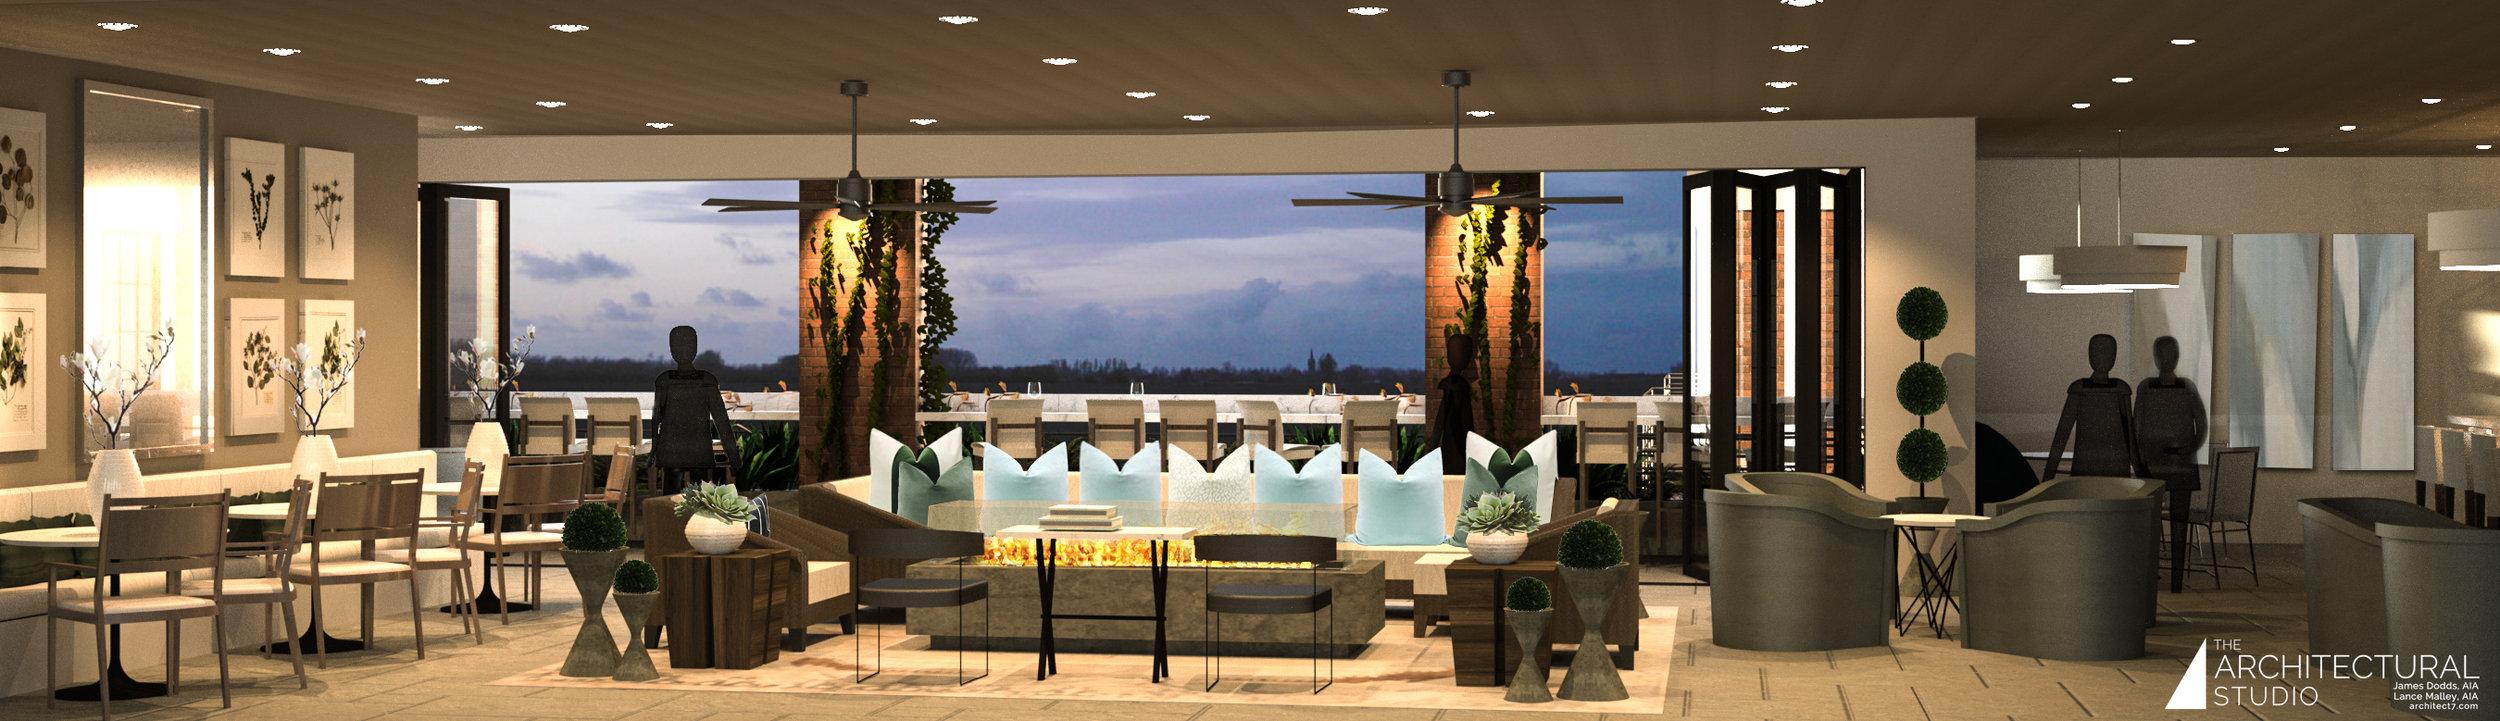 2813 Courtyard_Lounge Area.jpg